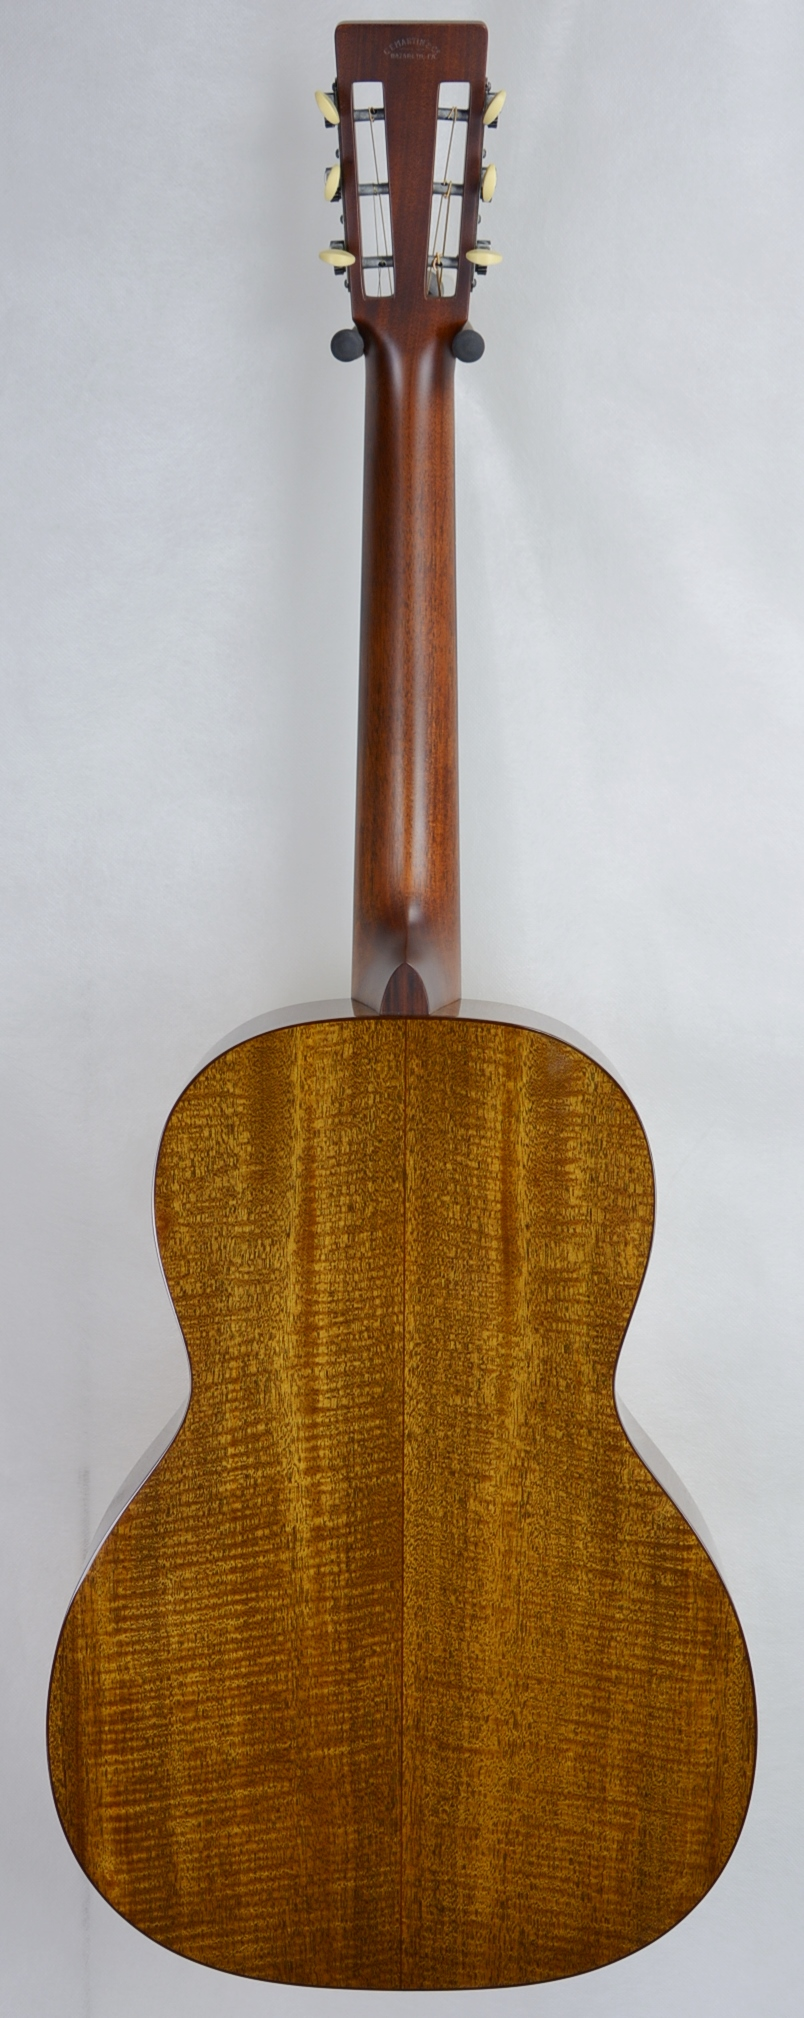 Q-2396024 S-1827233 00-12 Fiddleback Alpine Fine HB (1).JPG